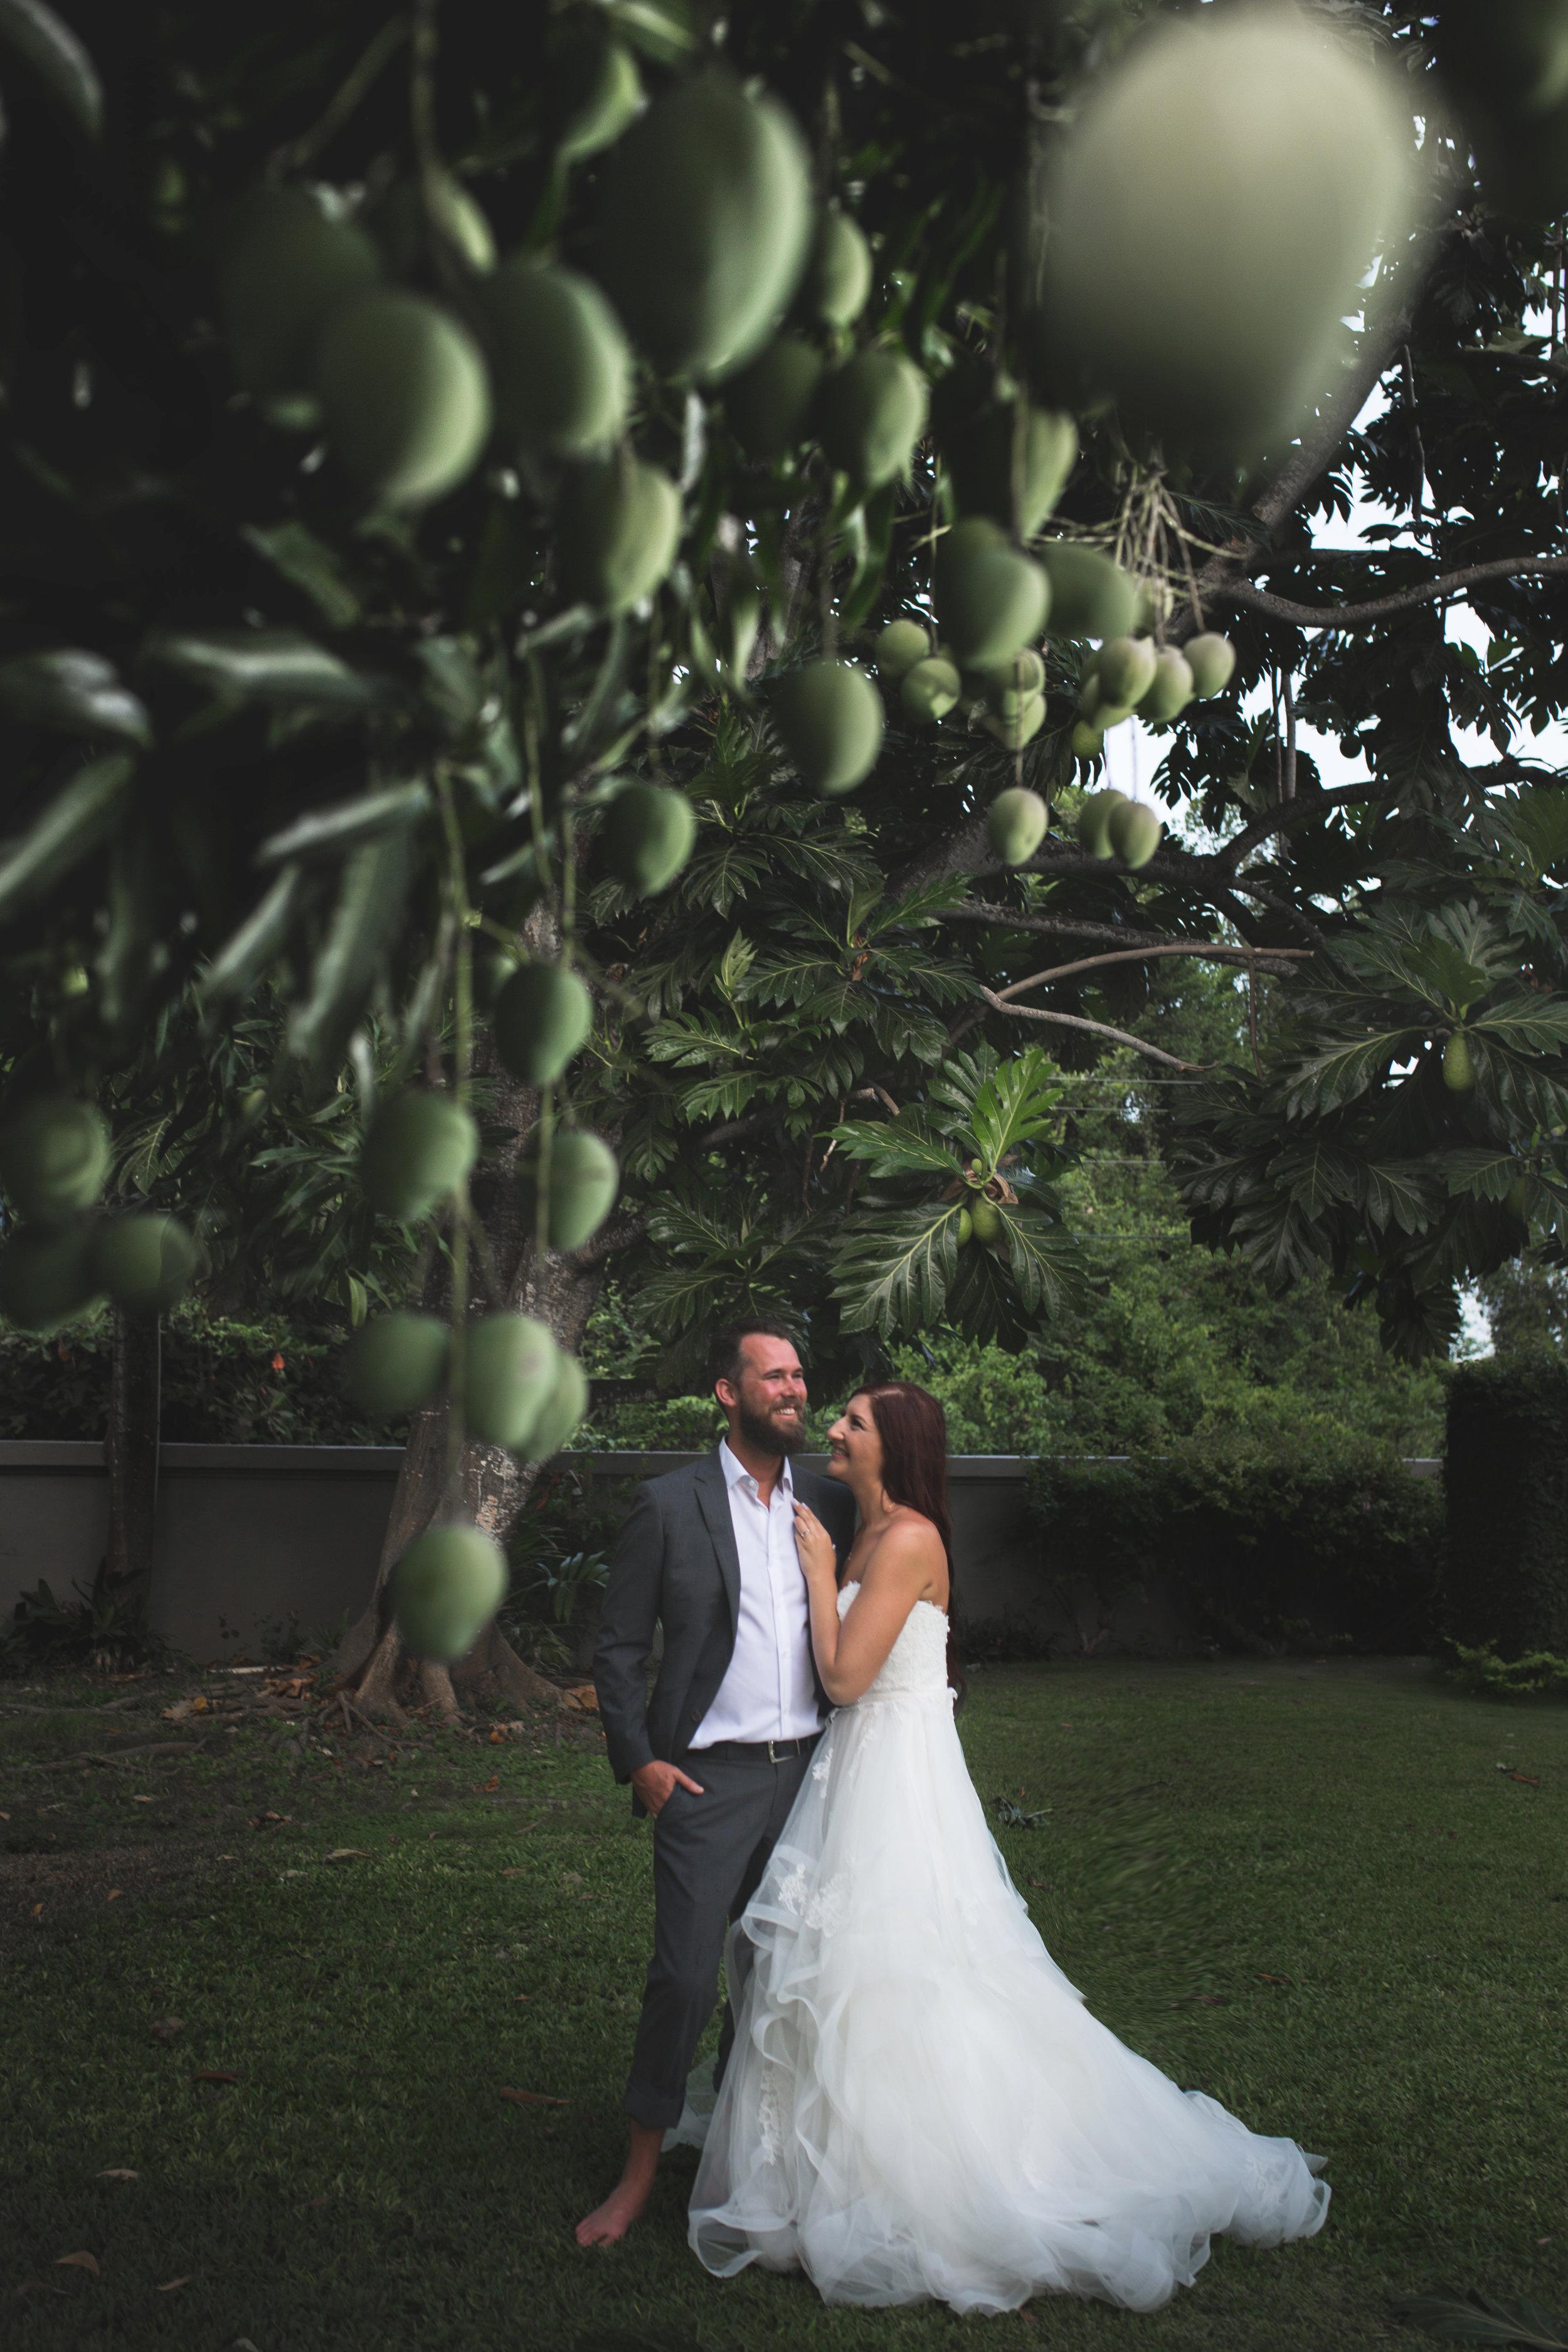 NOLOGO-02-Adam-Ziorio-Photography-Emily&Mason-Jamaica-Wedding.jpg